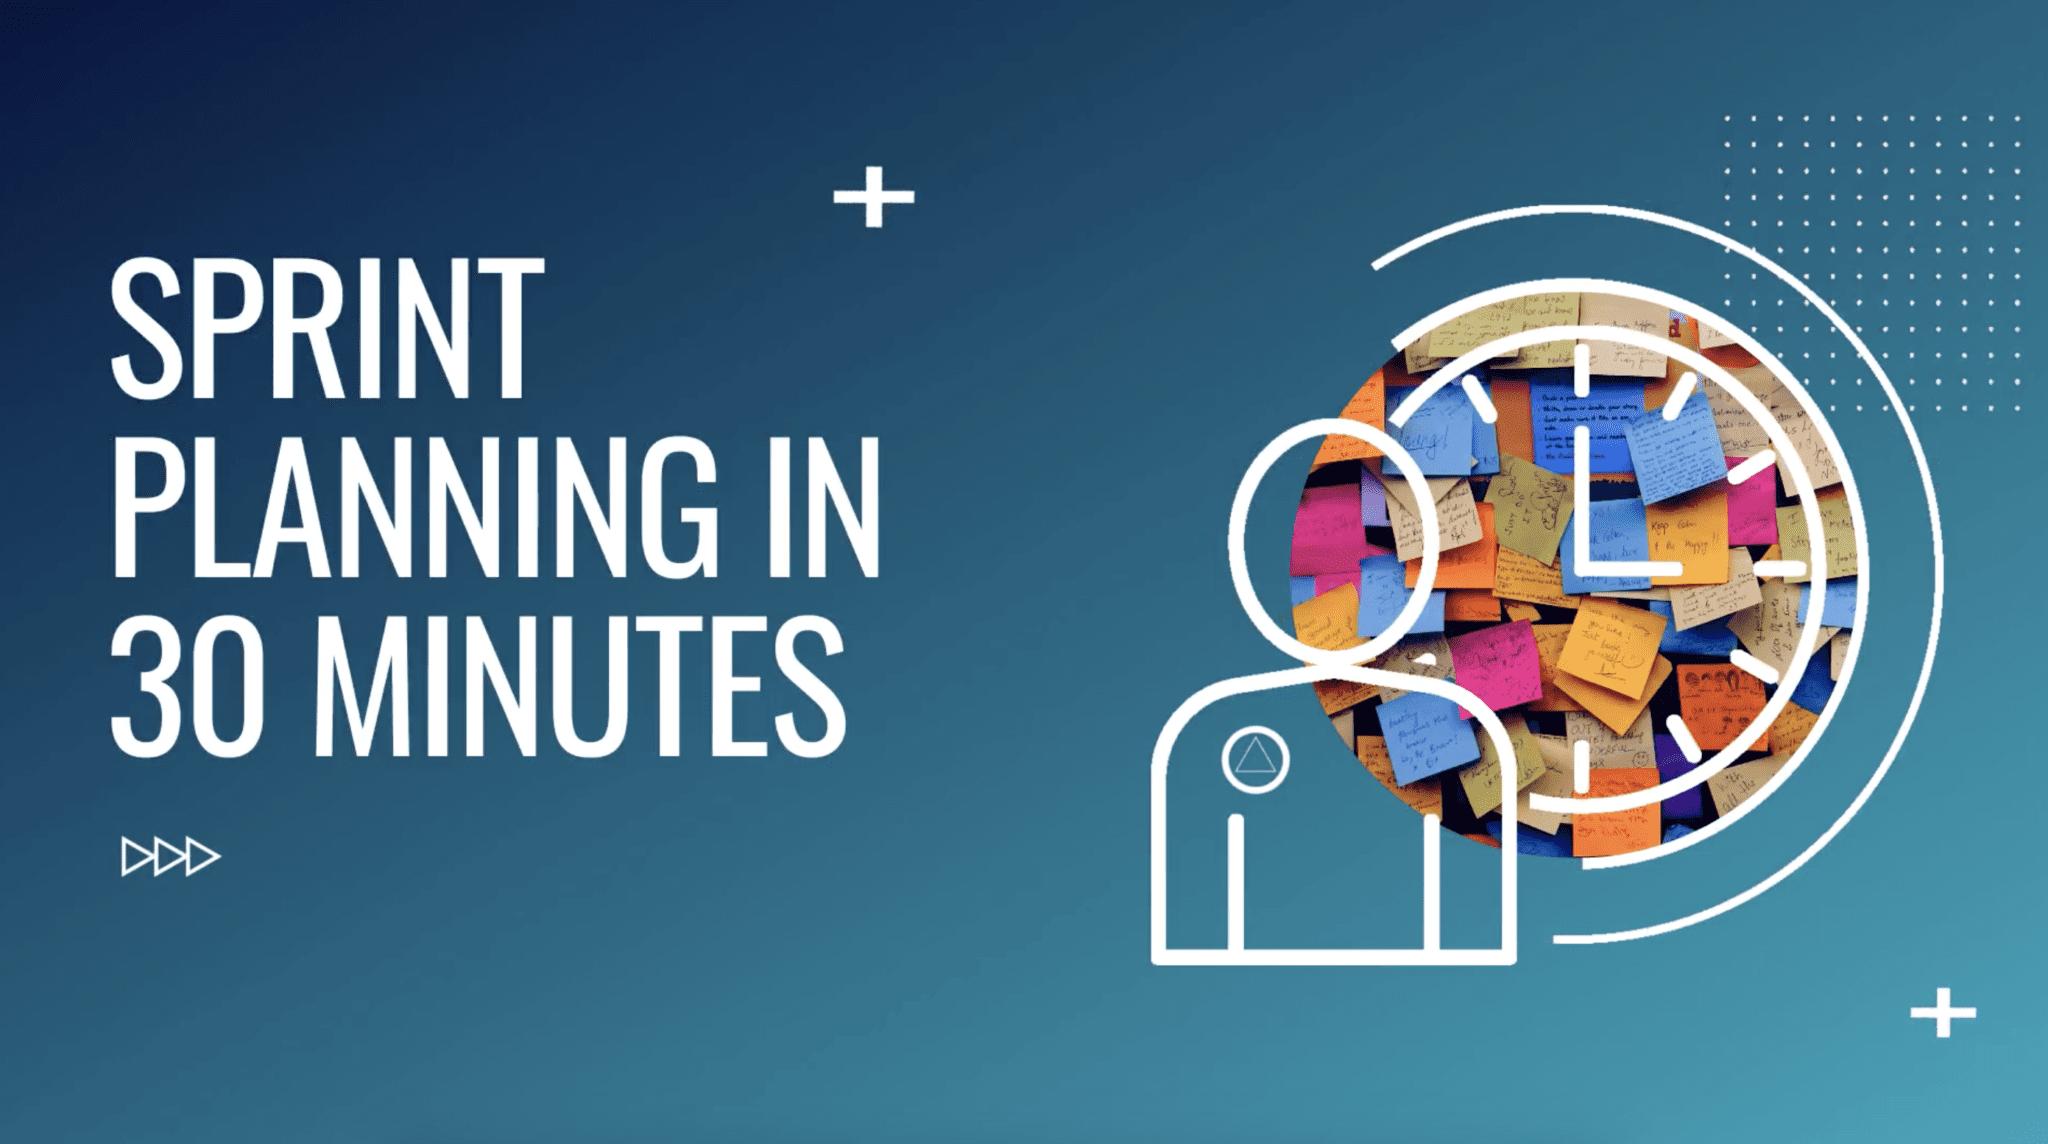 Webinar: Sprint Planning in 30 Minutes